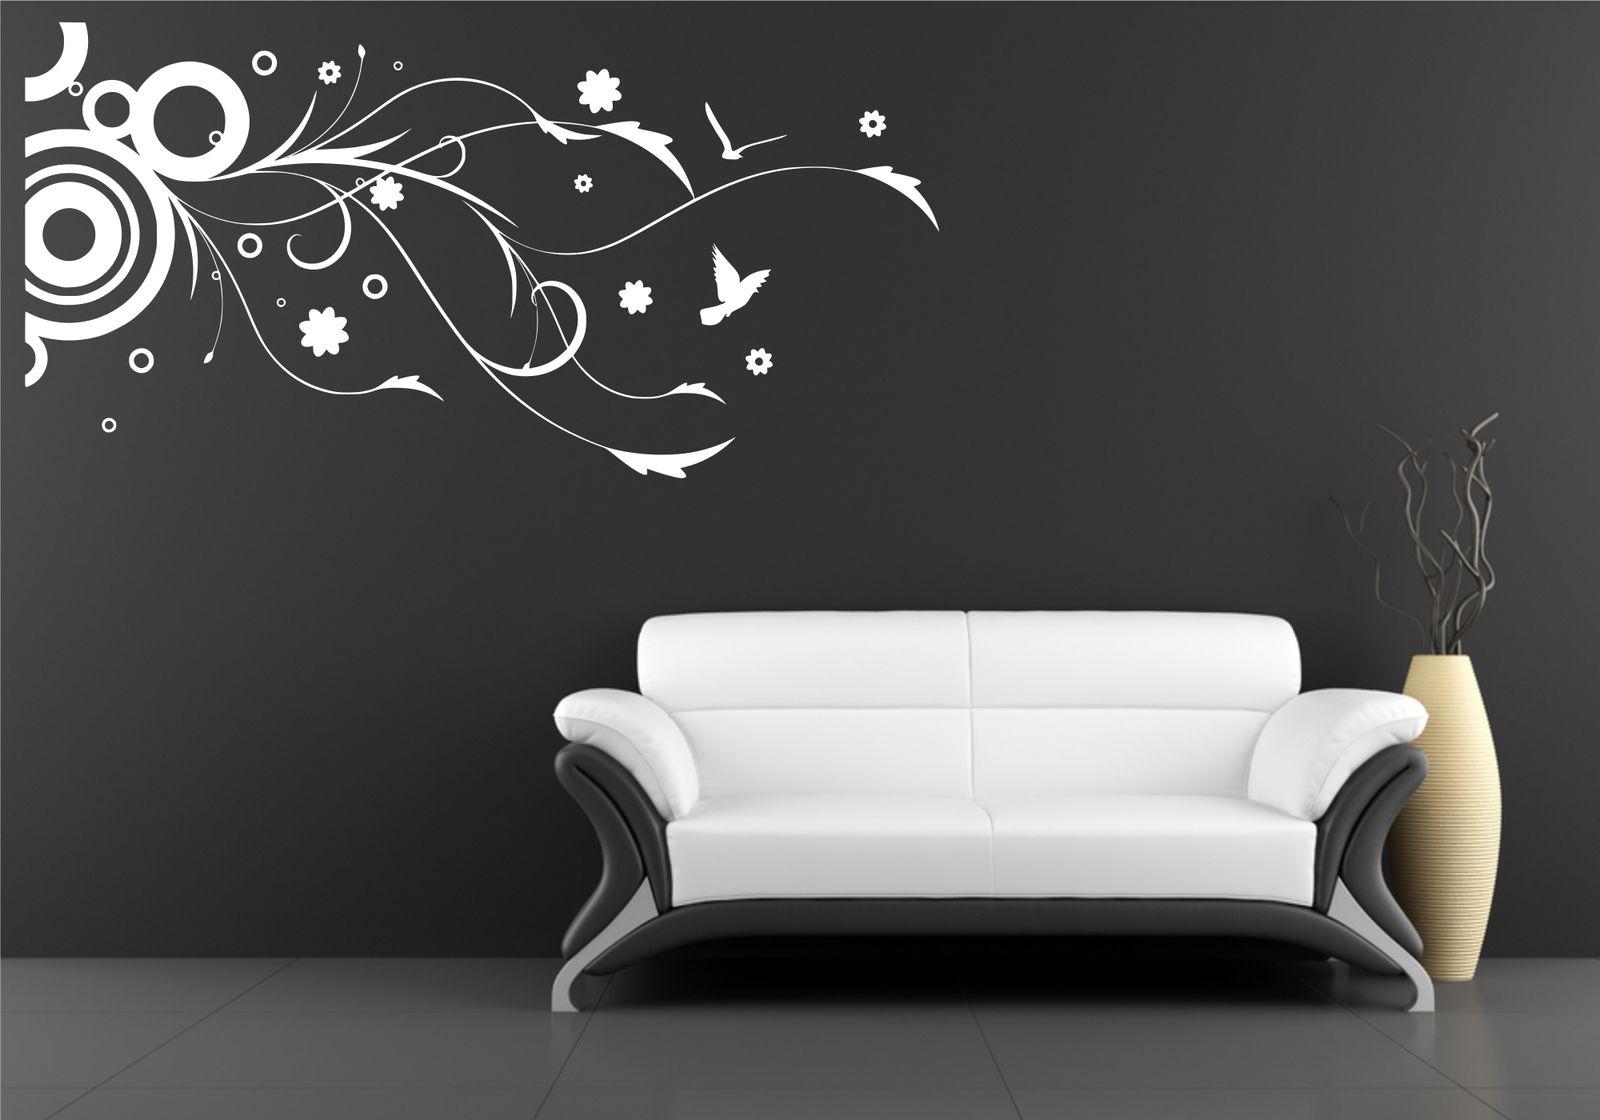 circle birds flower floral wall art wall sticker decal mural stencil vinyl print ebay. Black Bedroom Furniture Sets. Home Design Ideas